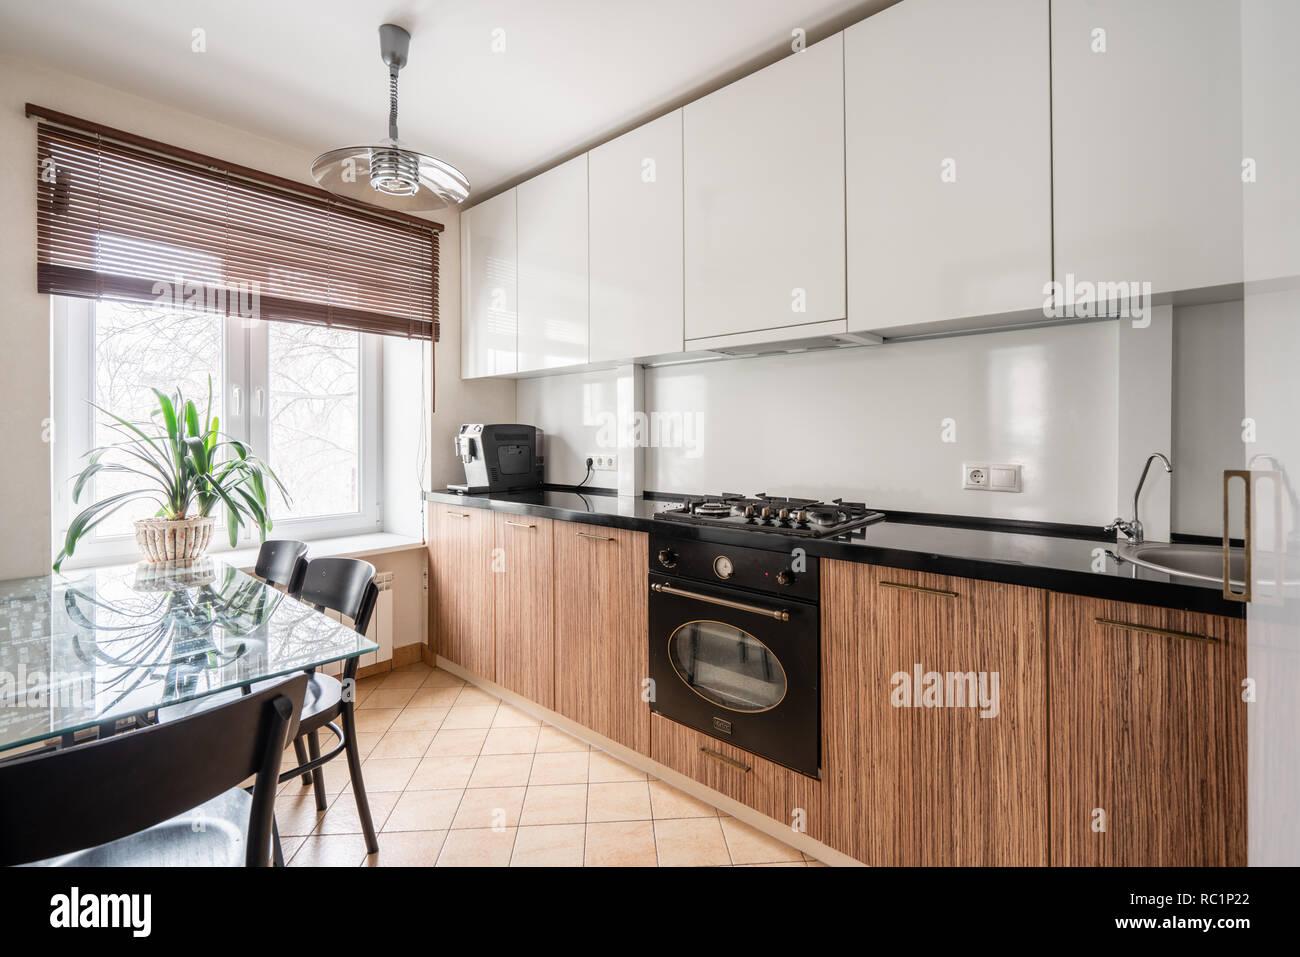 Cucina Bianca E Weng  | Cucina Laccata Bianca E Legno